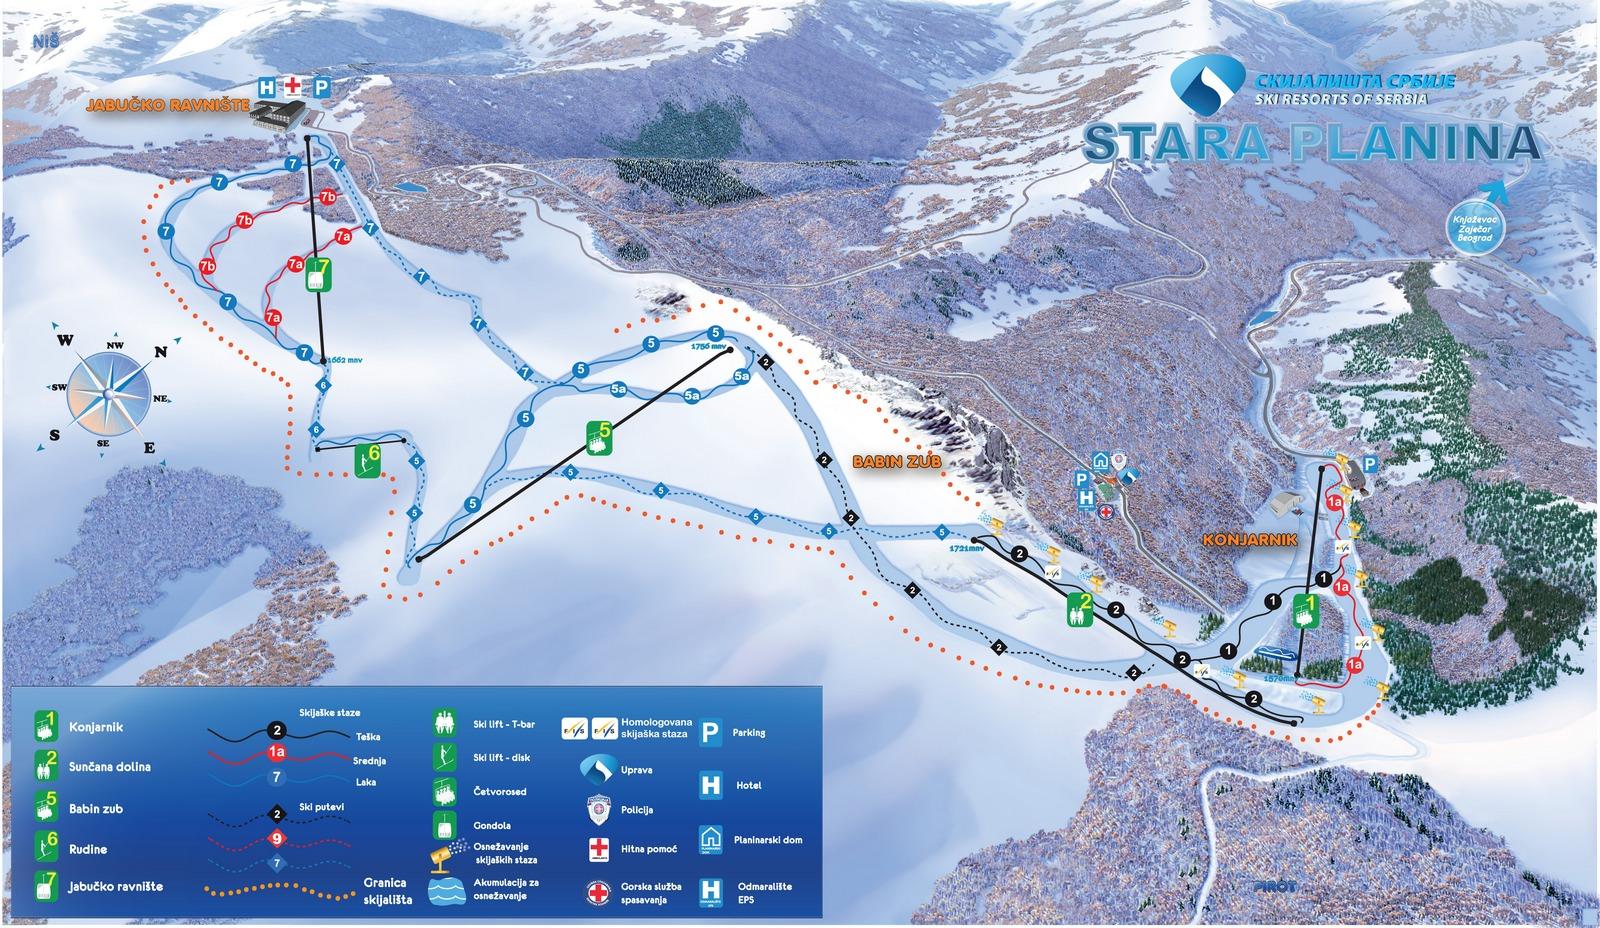 stara planina mapa Stara Planina/Babin Zub Piste Map / Trail Map (high res.) stara planina mapa